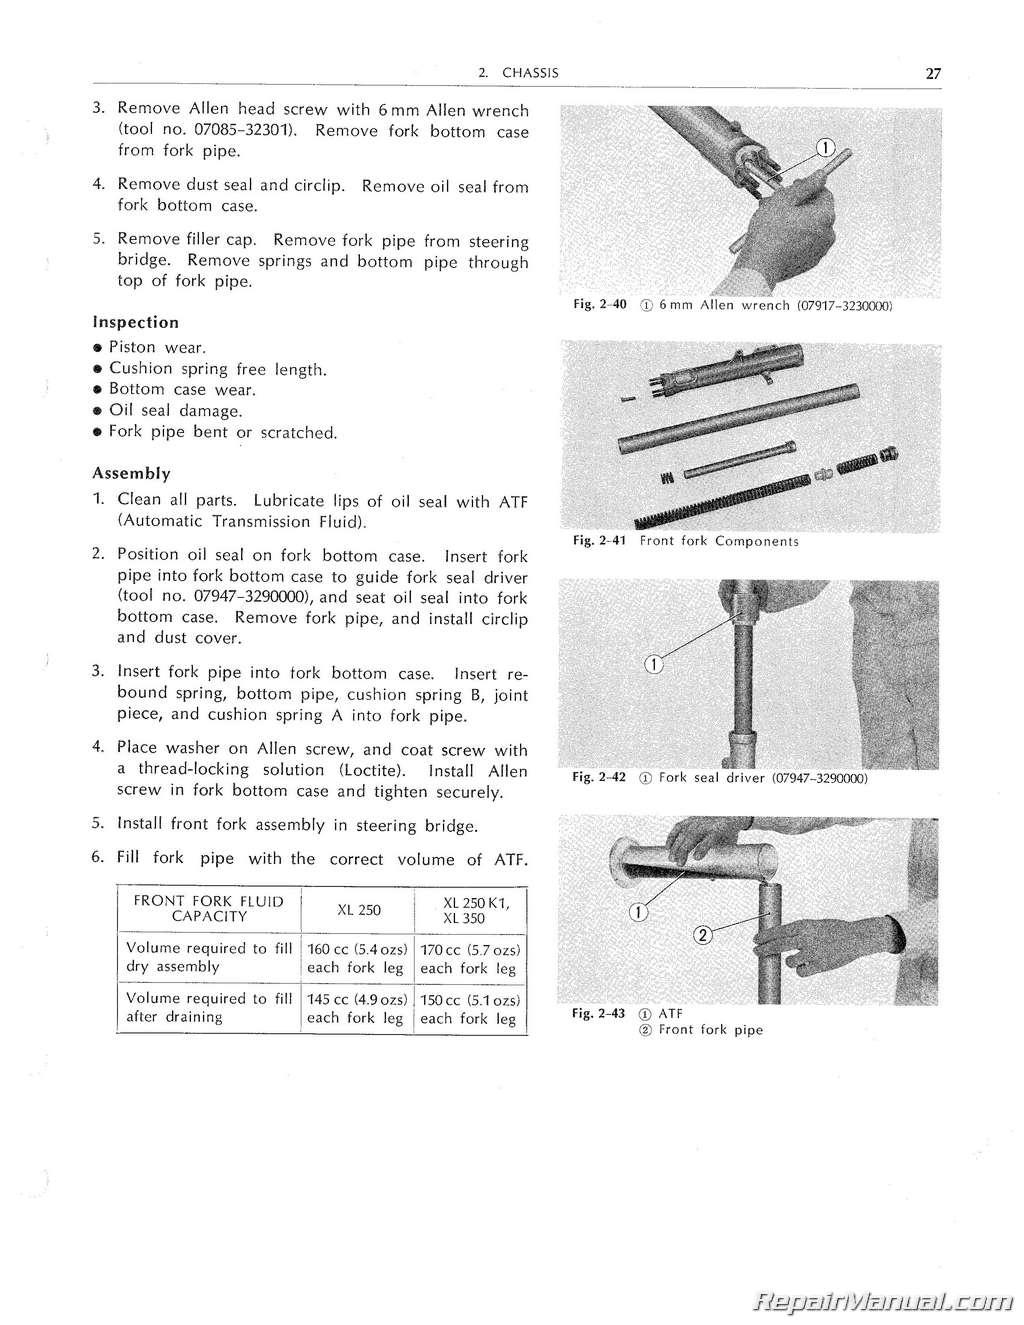 Honda Xl250 Xl350 Motorcycle Service Manual 1972 1978 1975 75 Schematics